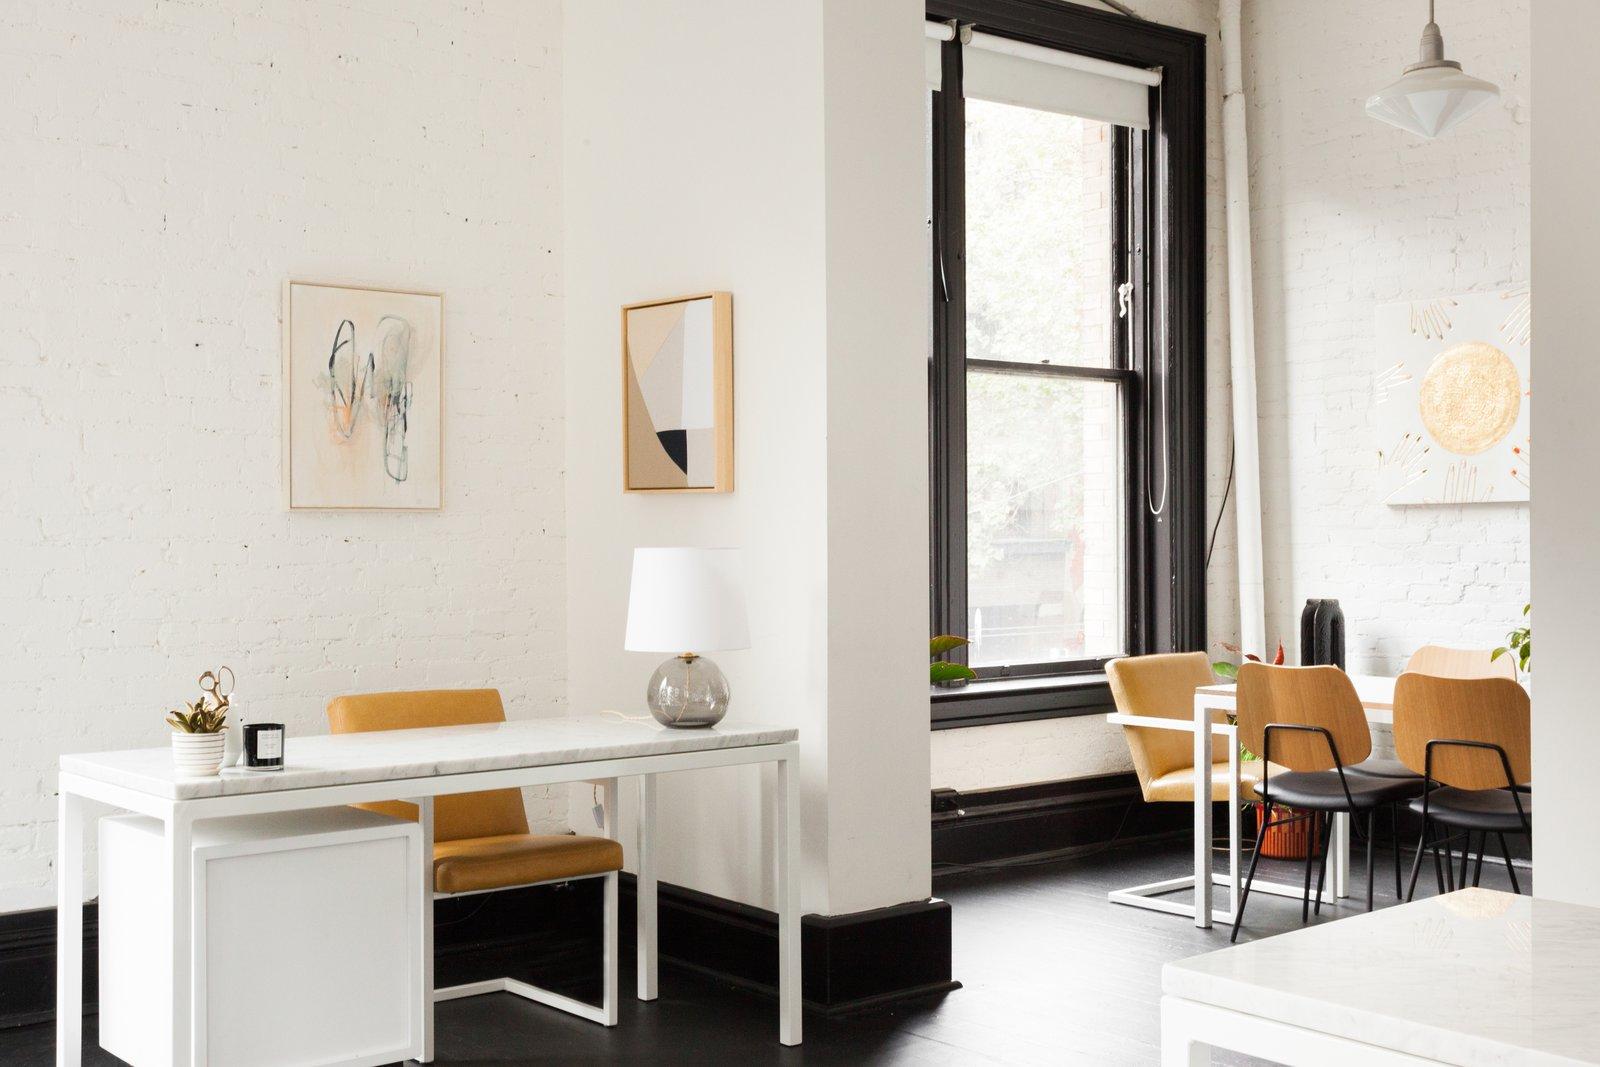 Jackson St. Studio by Coco Kelley Office